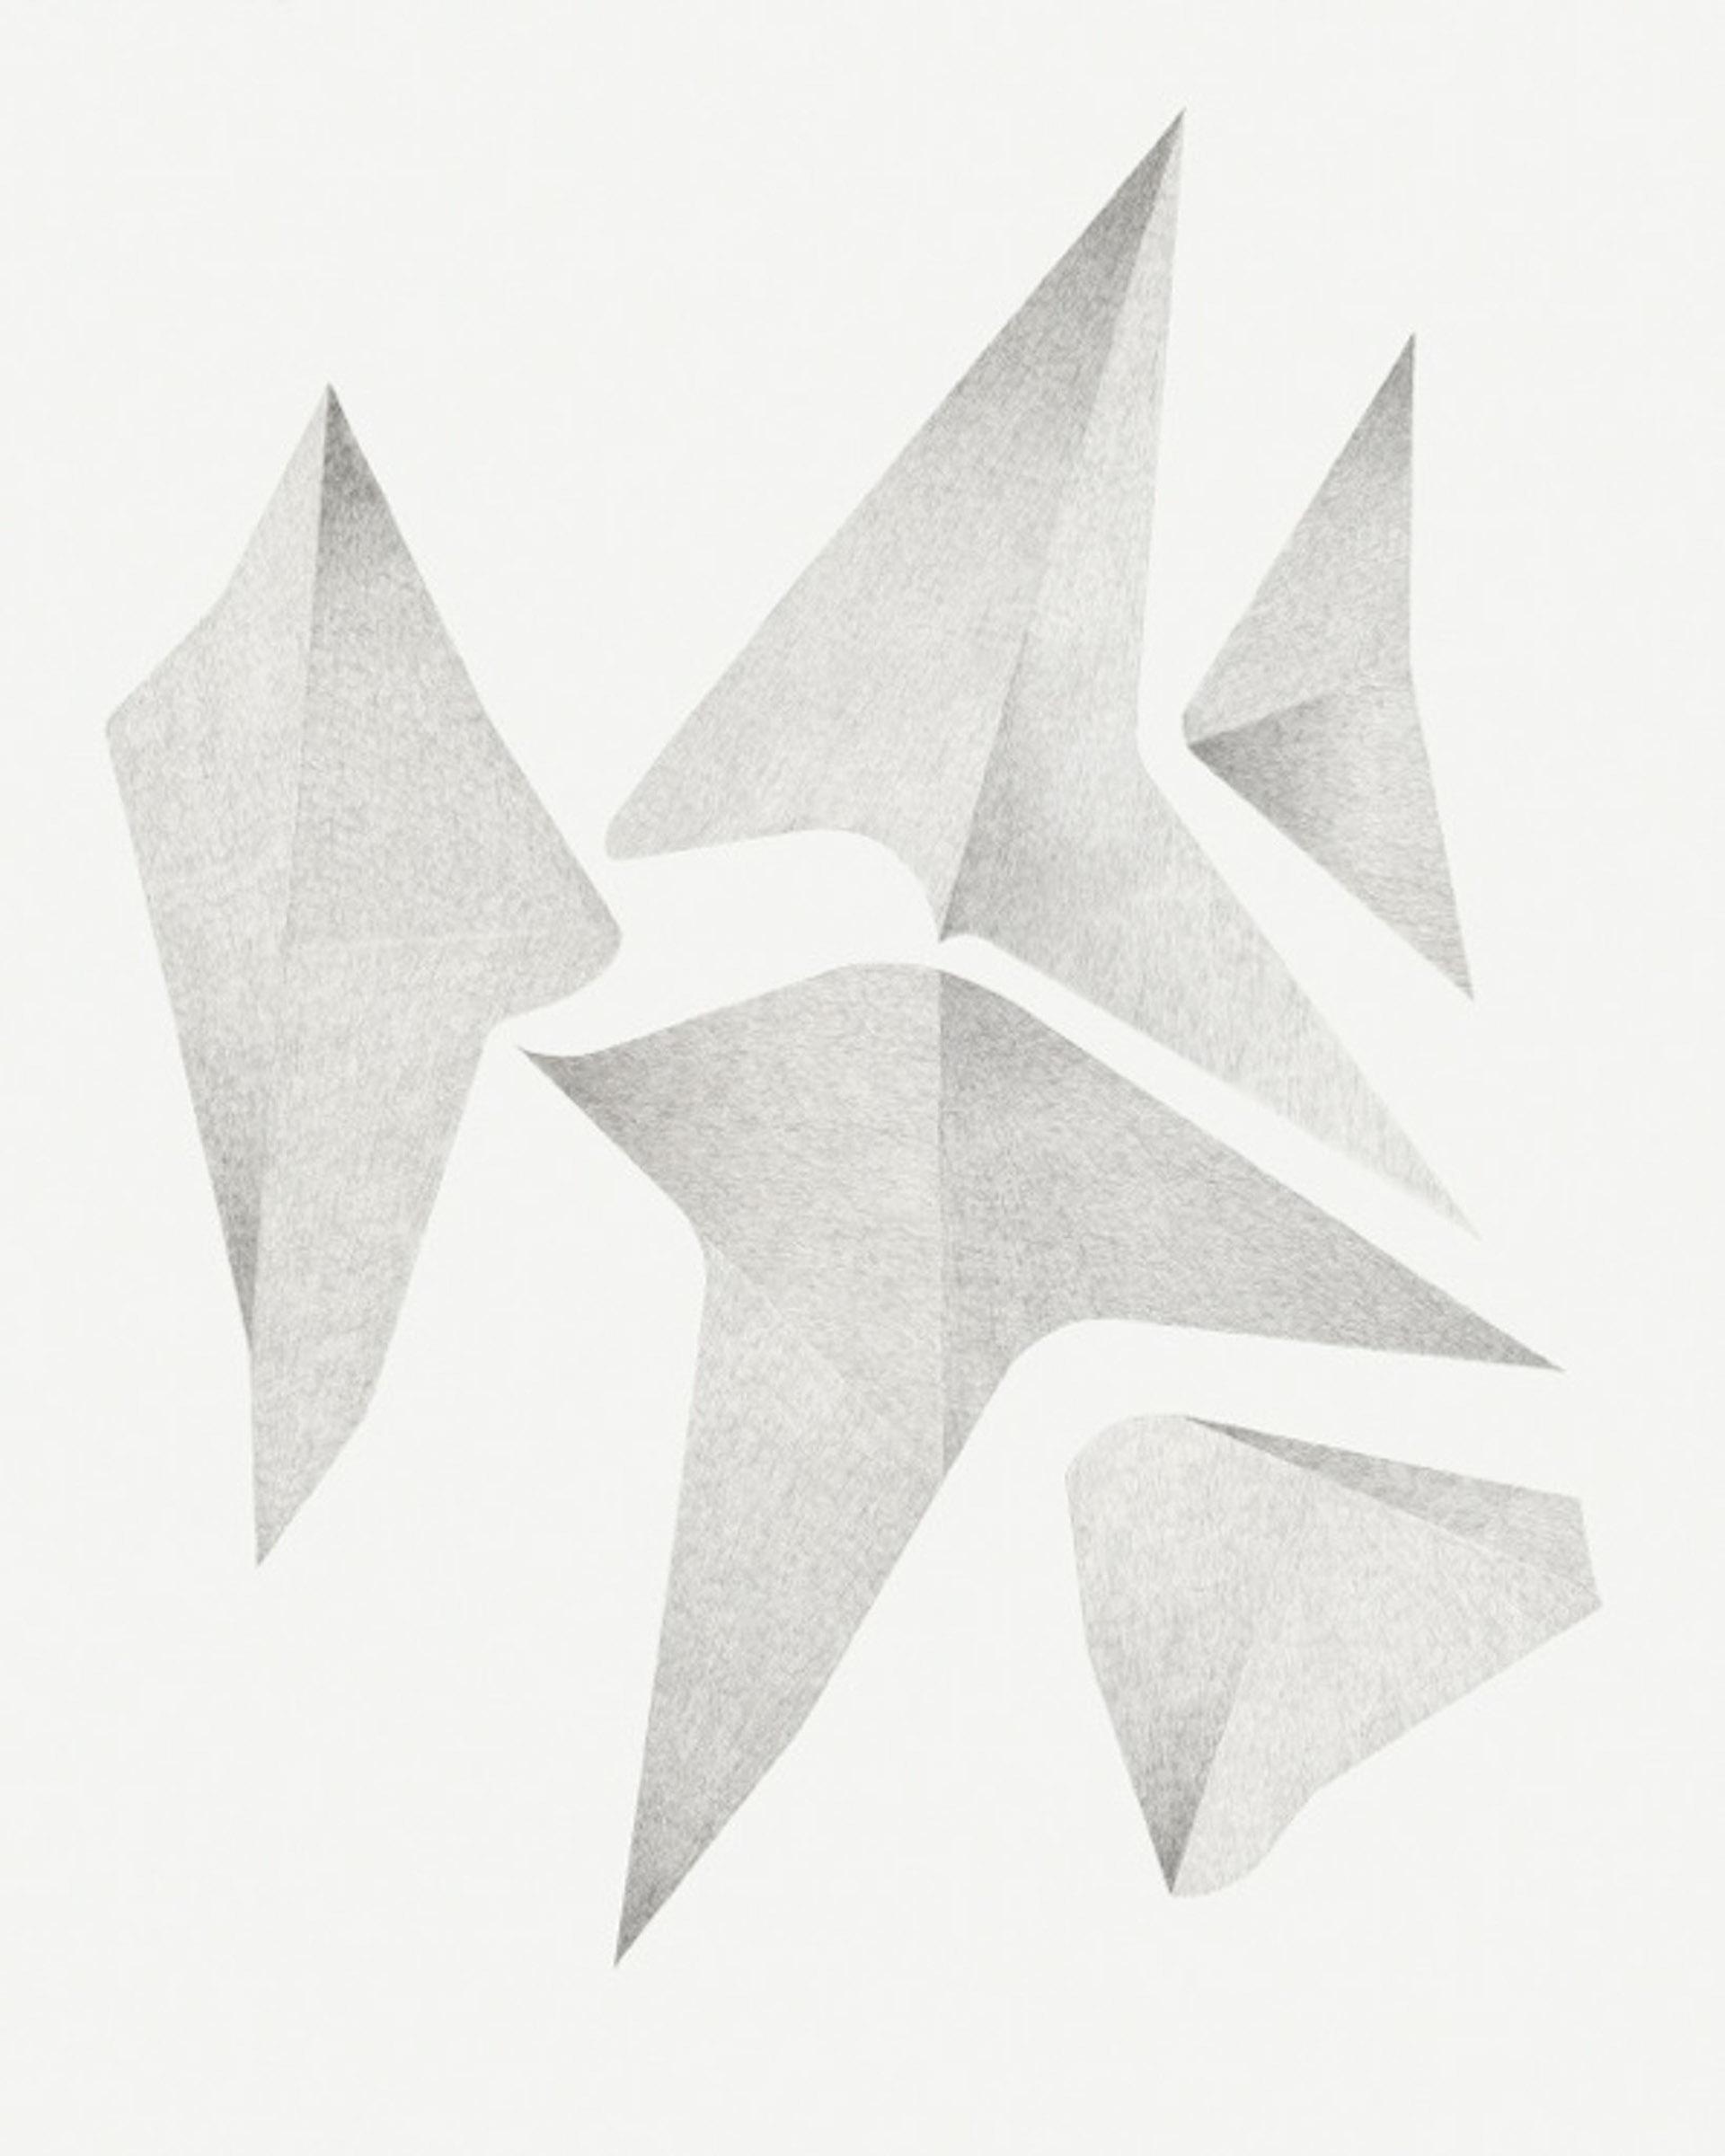 K-NO-2115-image